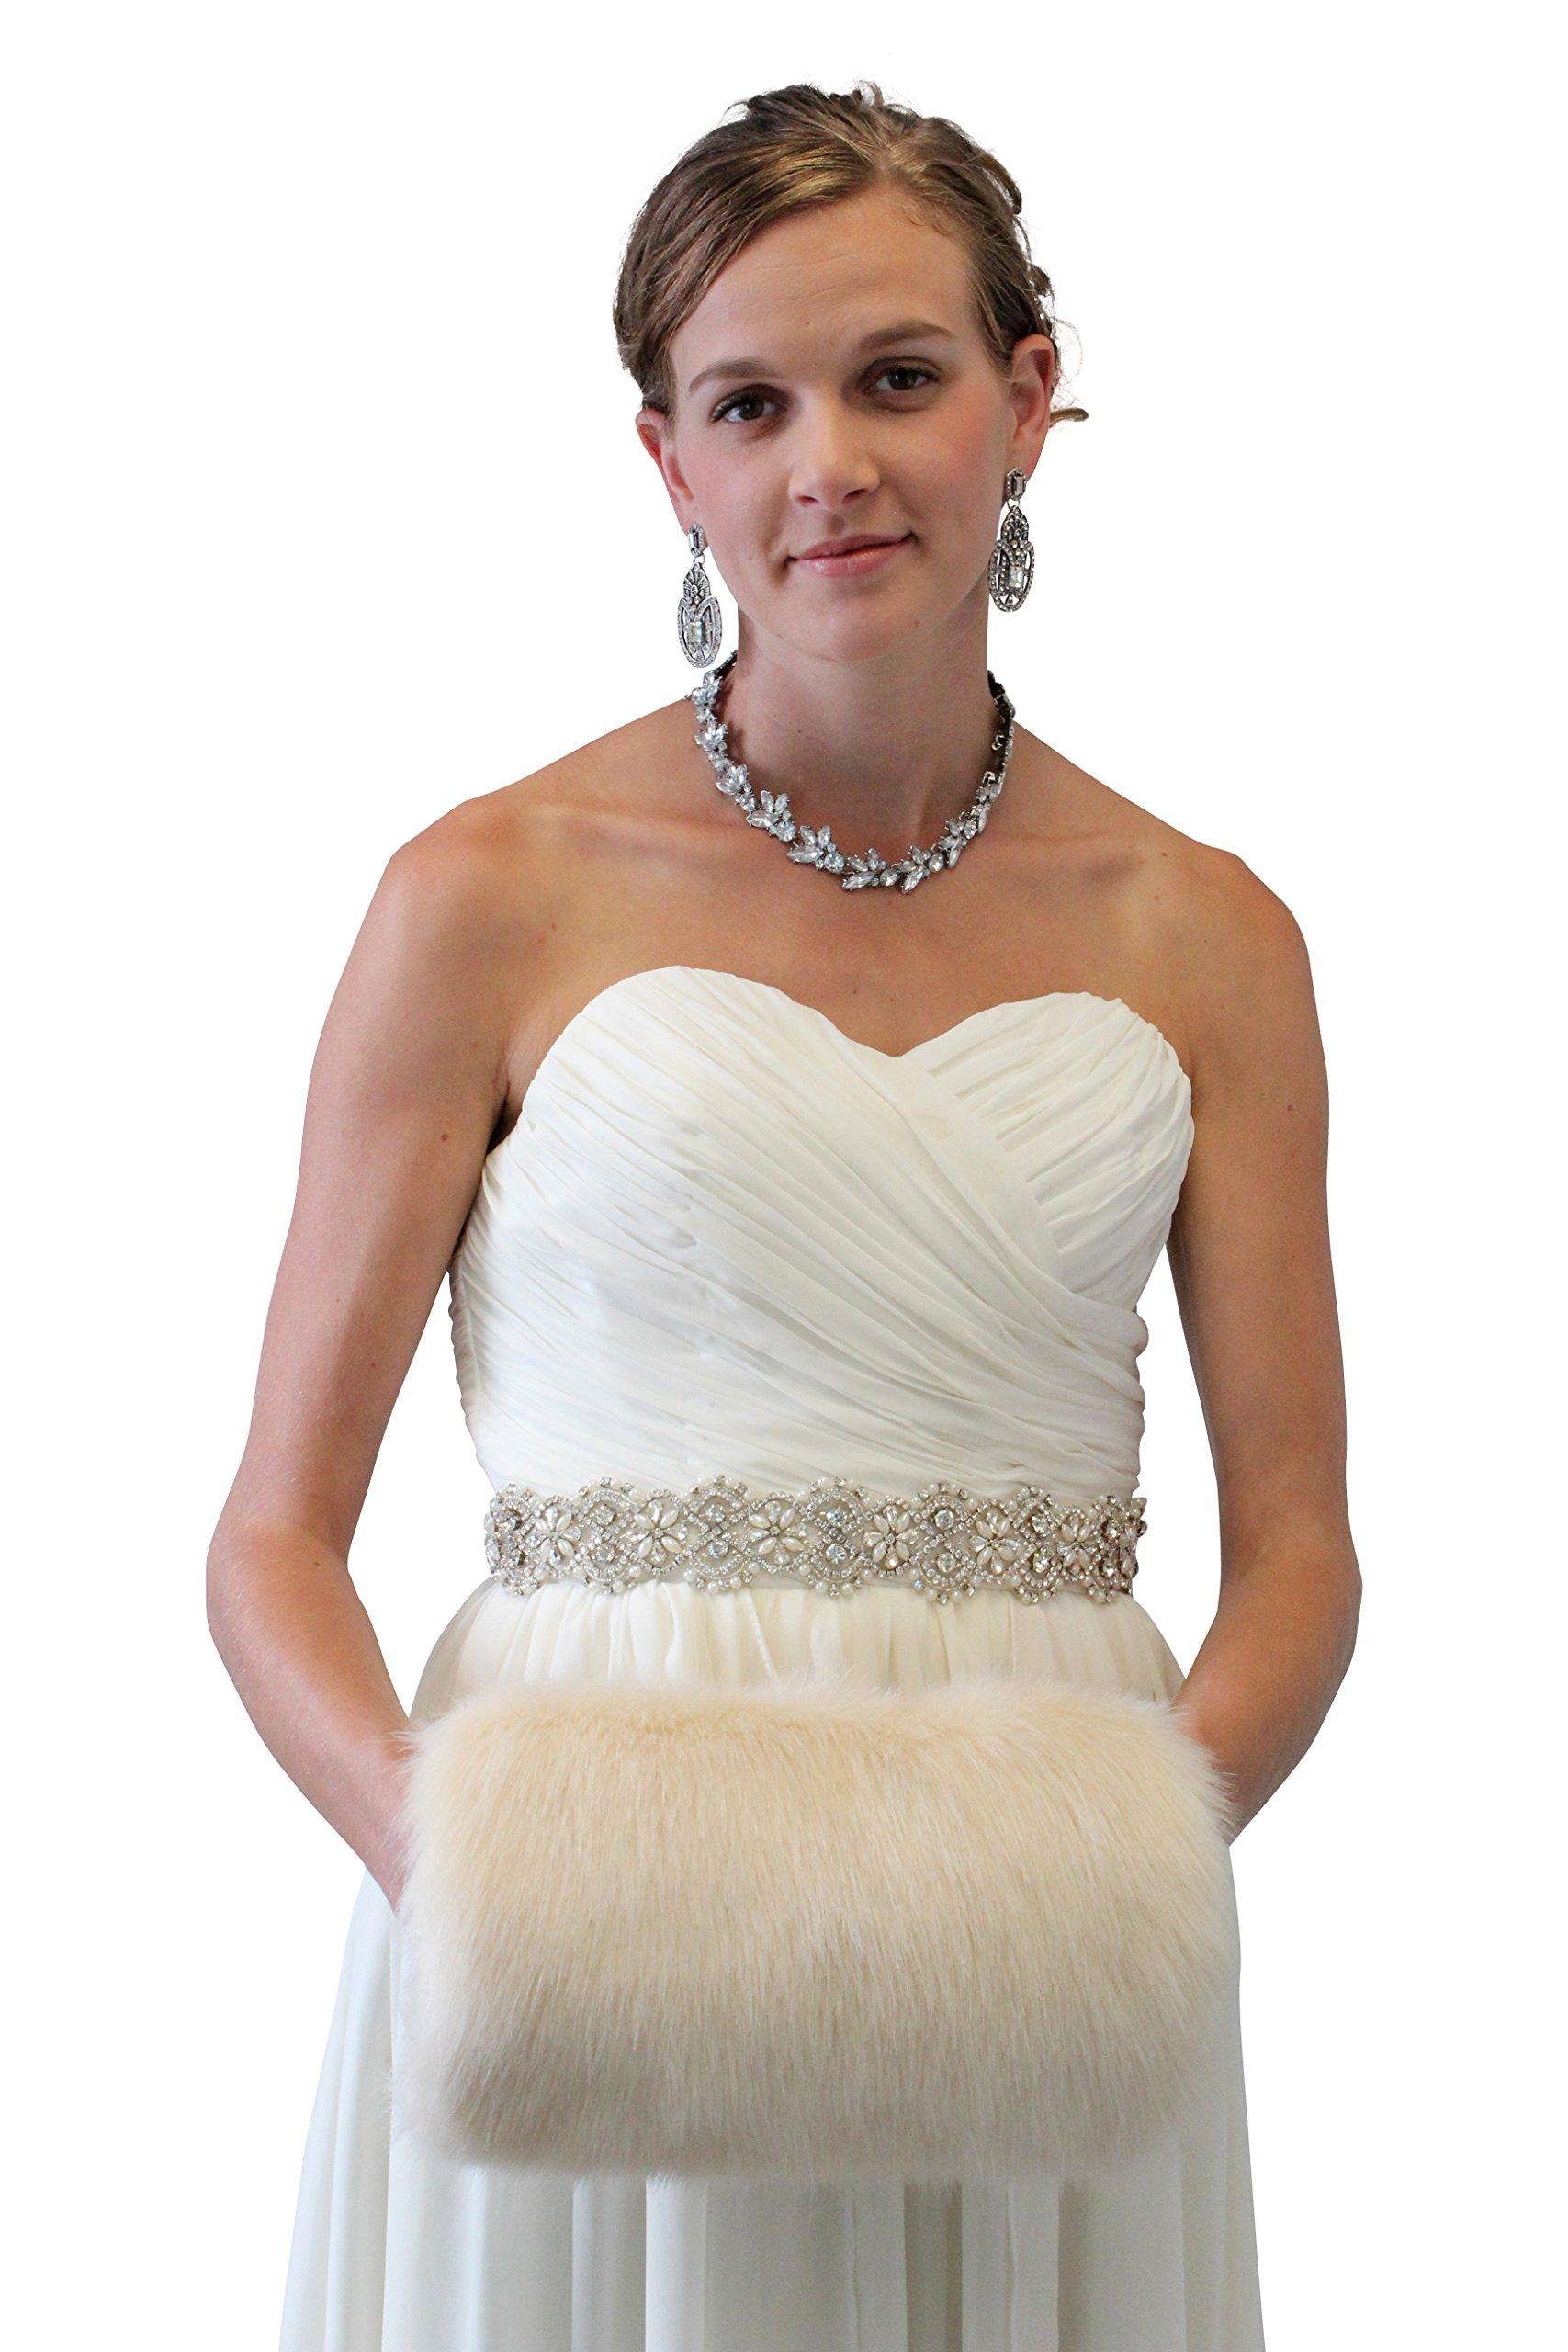 Tion Design Women's Bridal Fur Hand muff, Champagne Wedding Fur Hand Muff L by Tion Design  (Image #2)